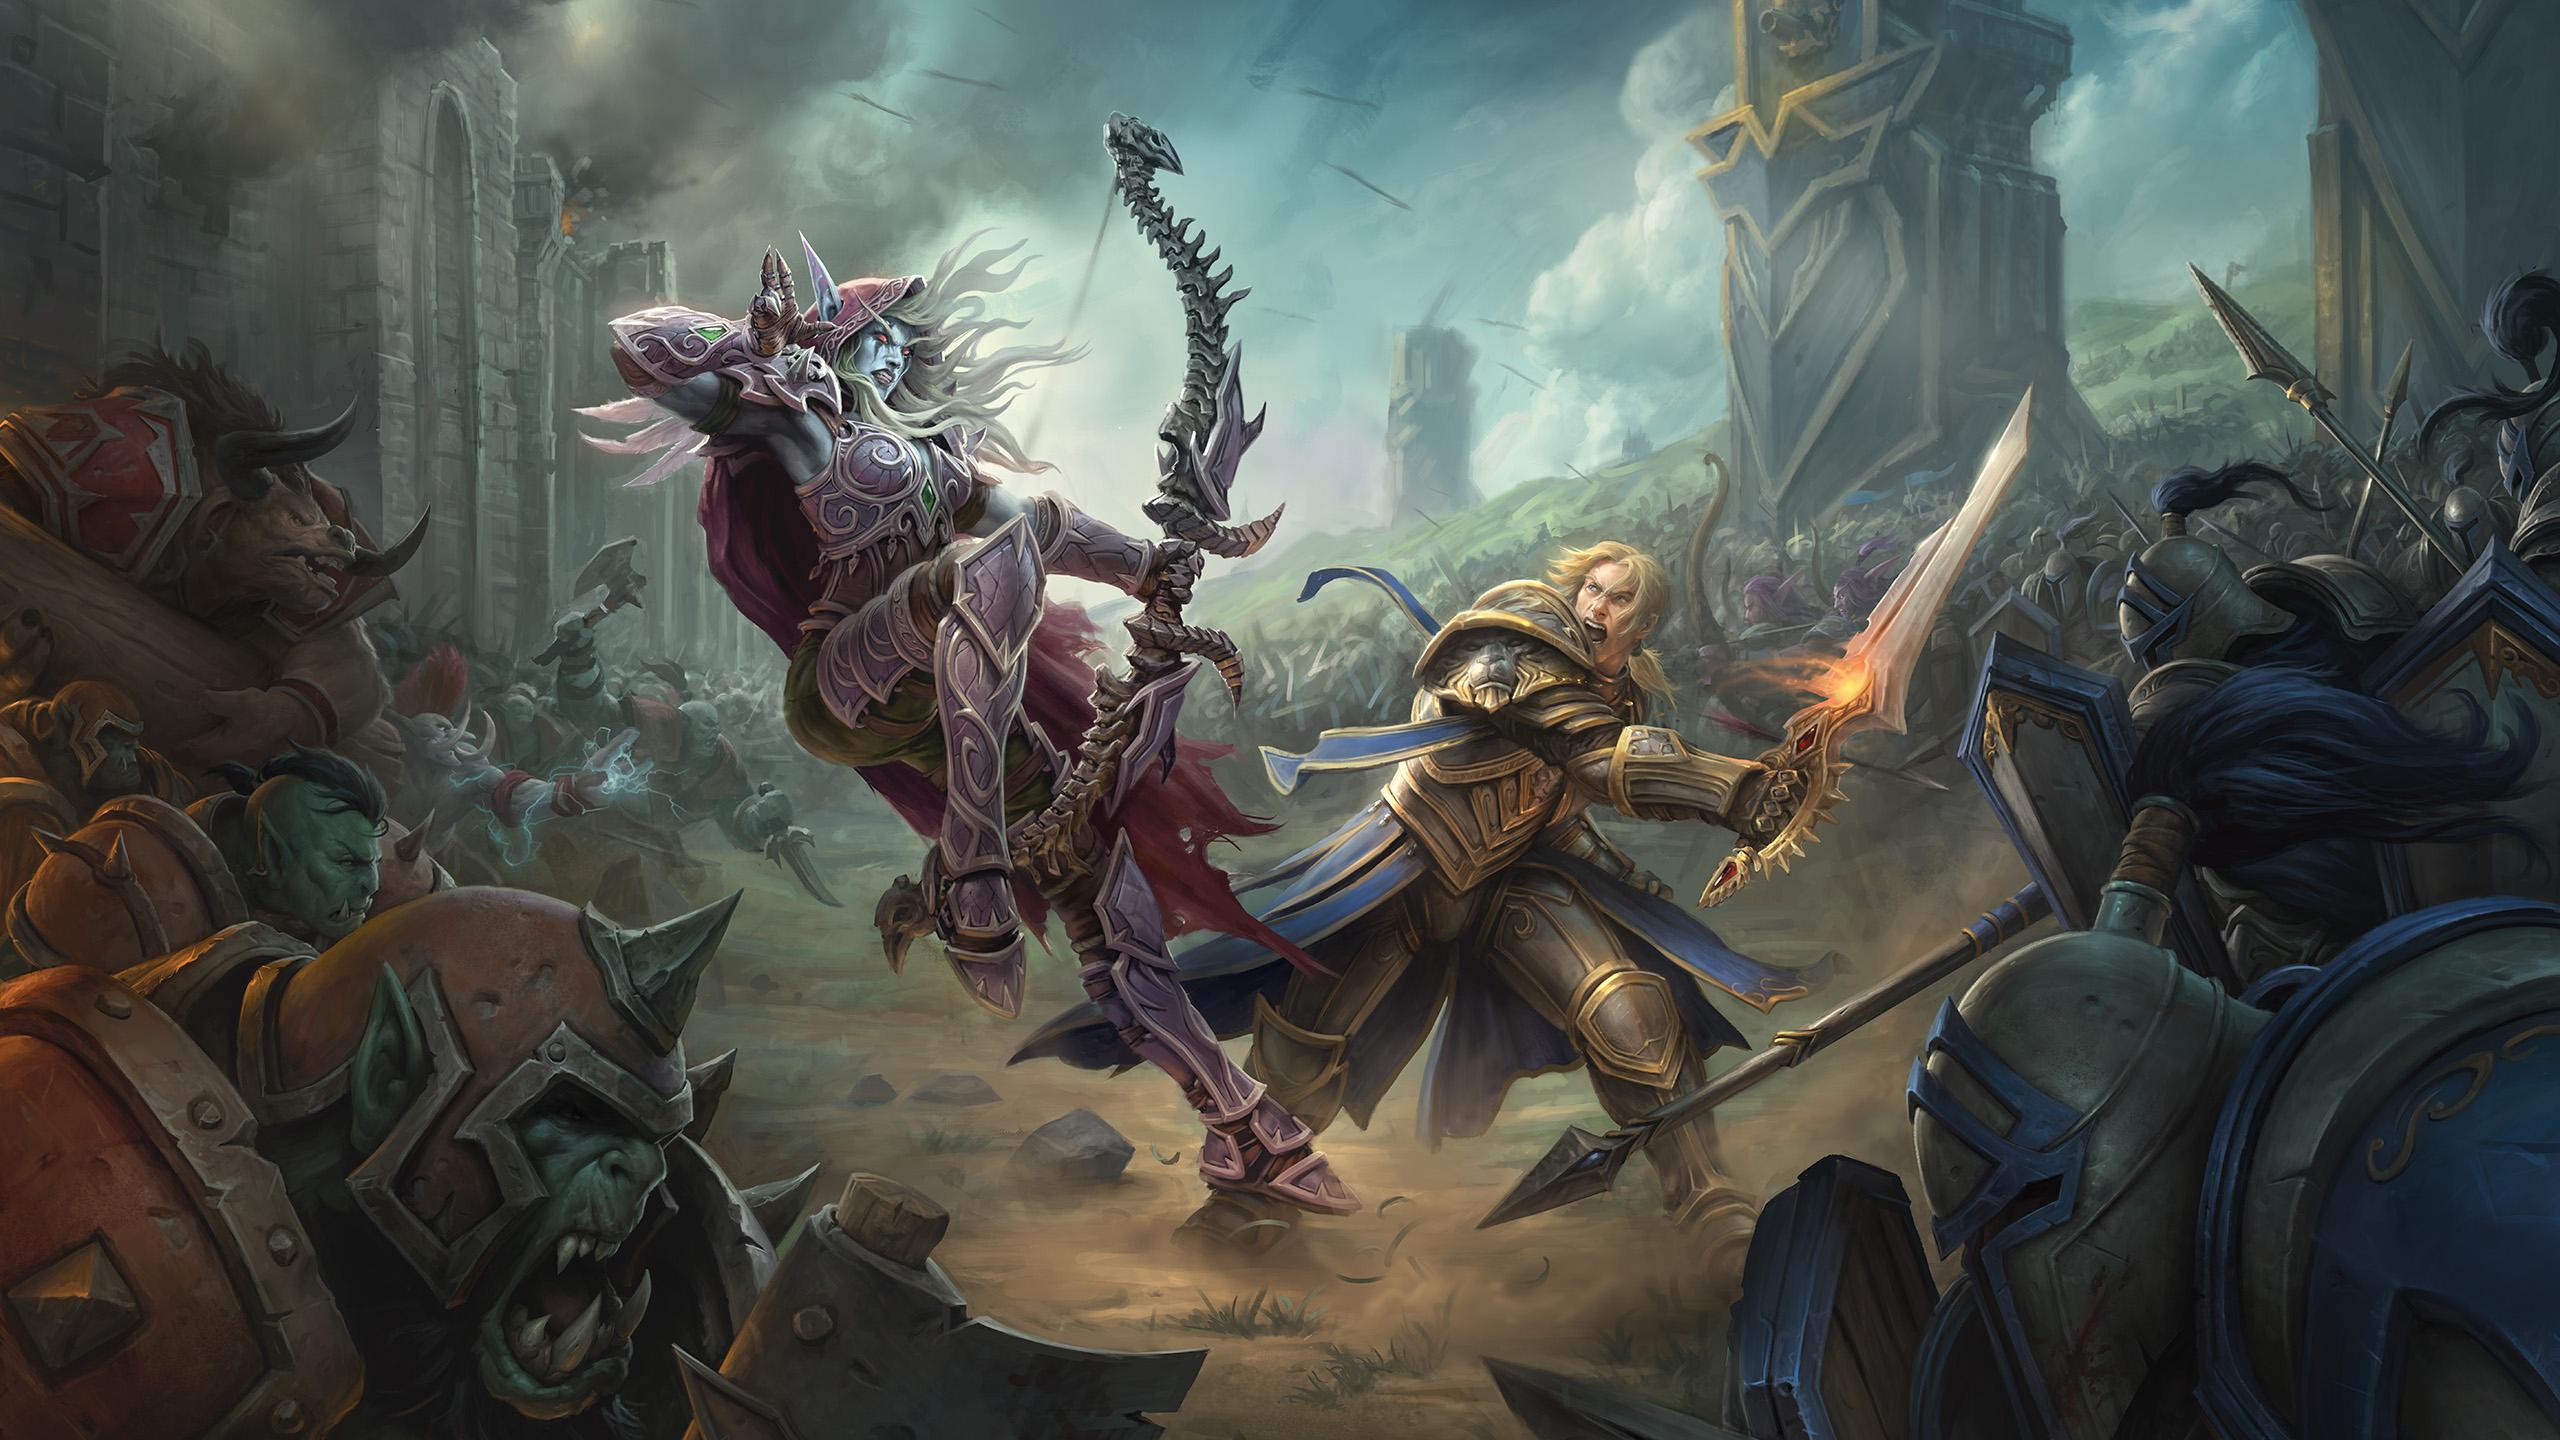 General 2560x1440 World of Warcraft: Battle for Azeroth Sylvanas Windrunner Anduin Wrynn video games World of Warcraft Alliance horde artwork fantasy art digital art archer sword orcs